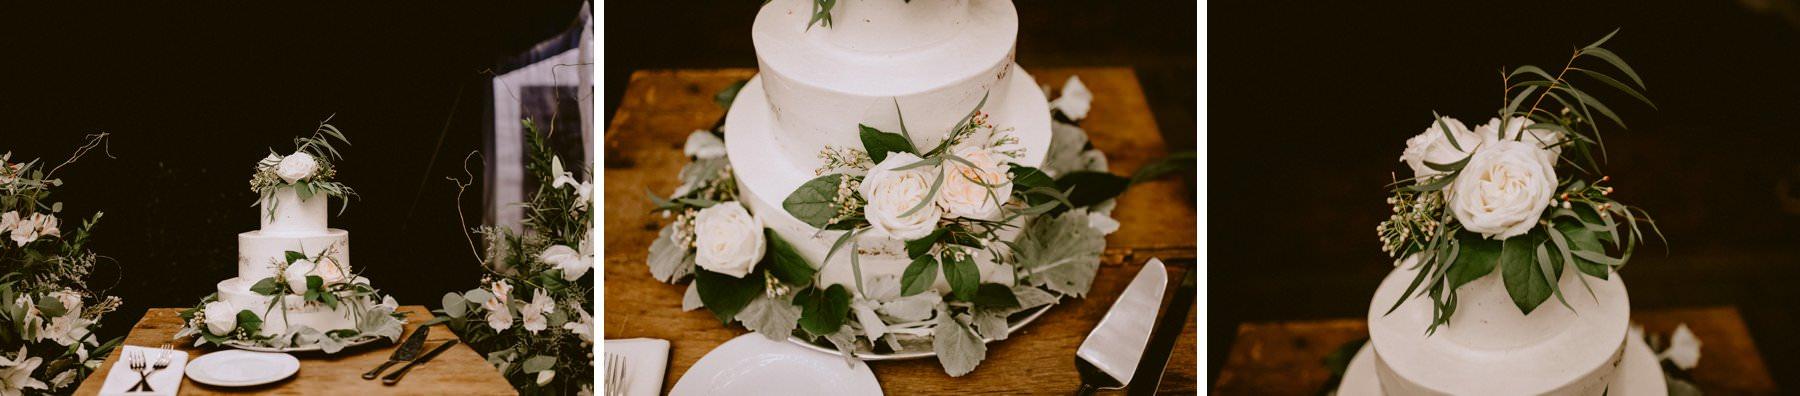 Tyler_arboretum_wedding-088.jpg